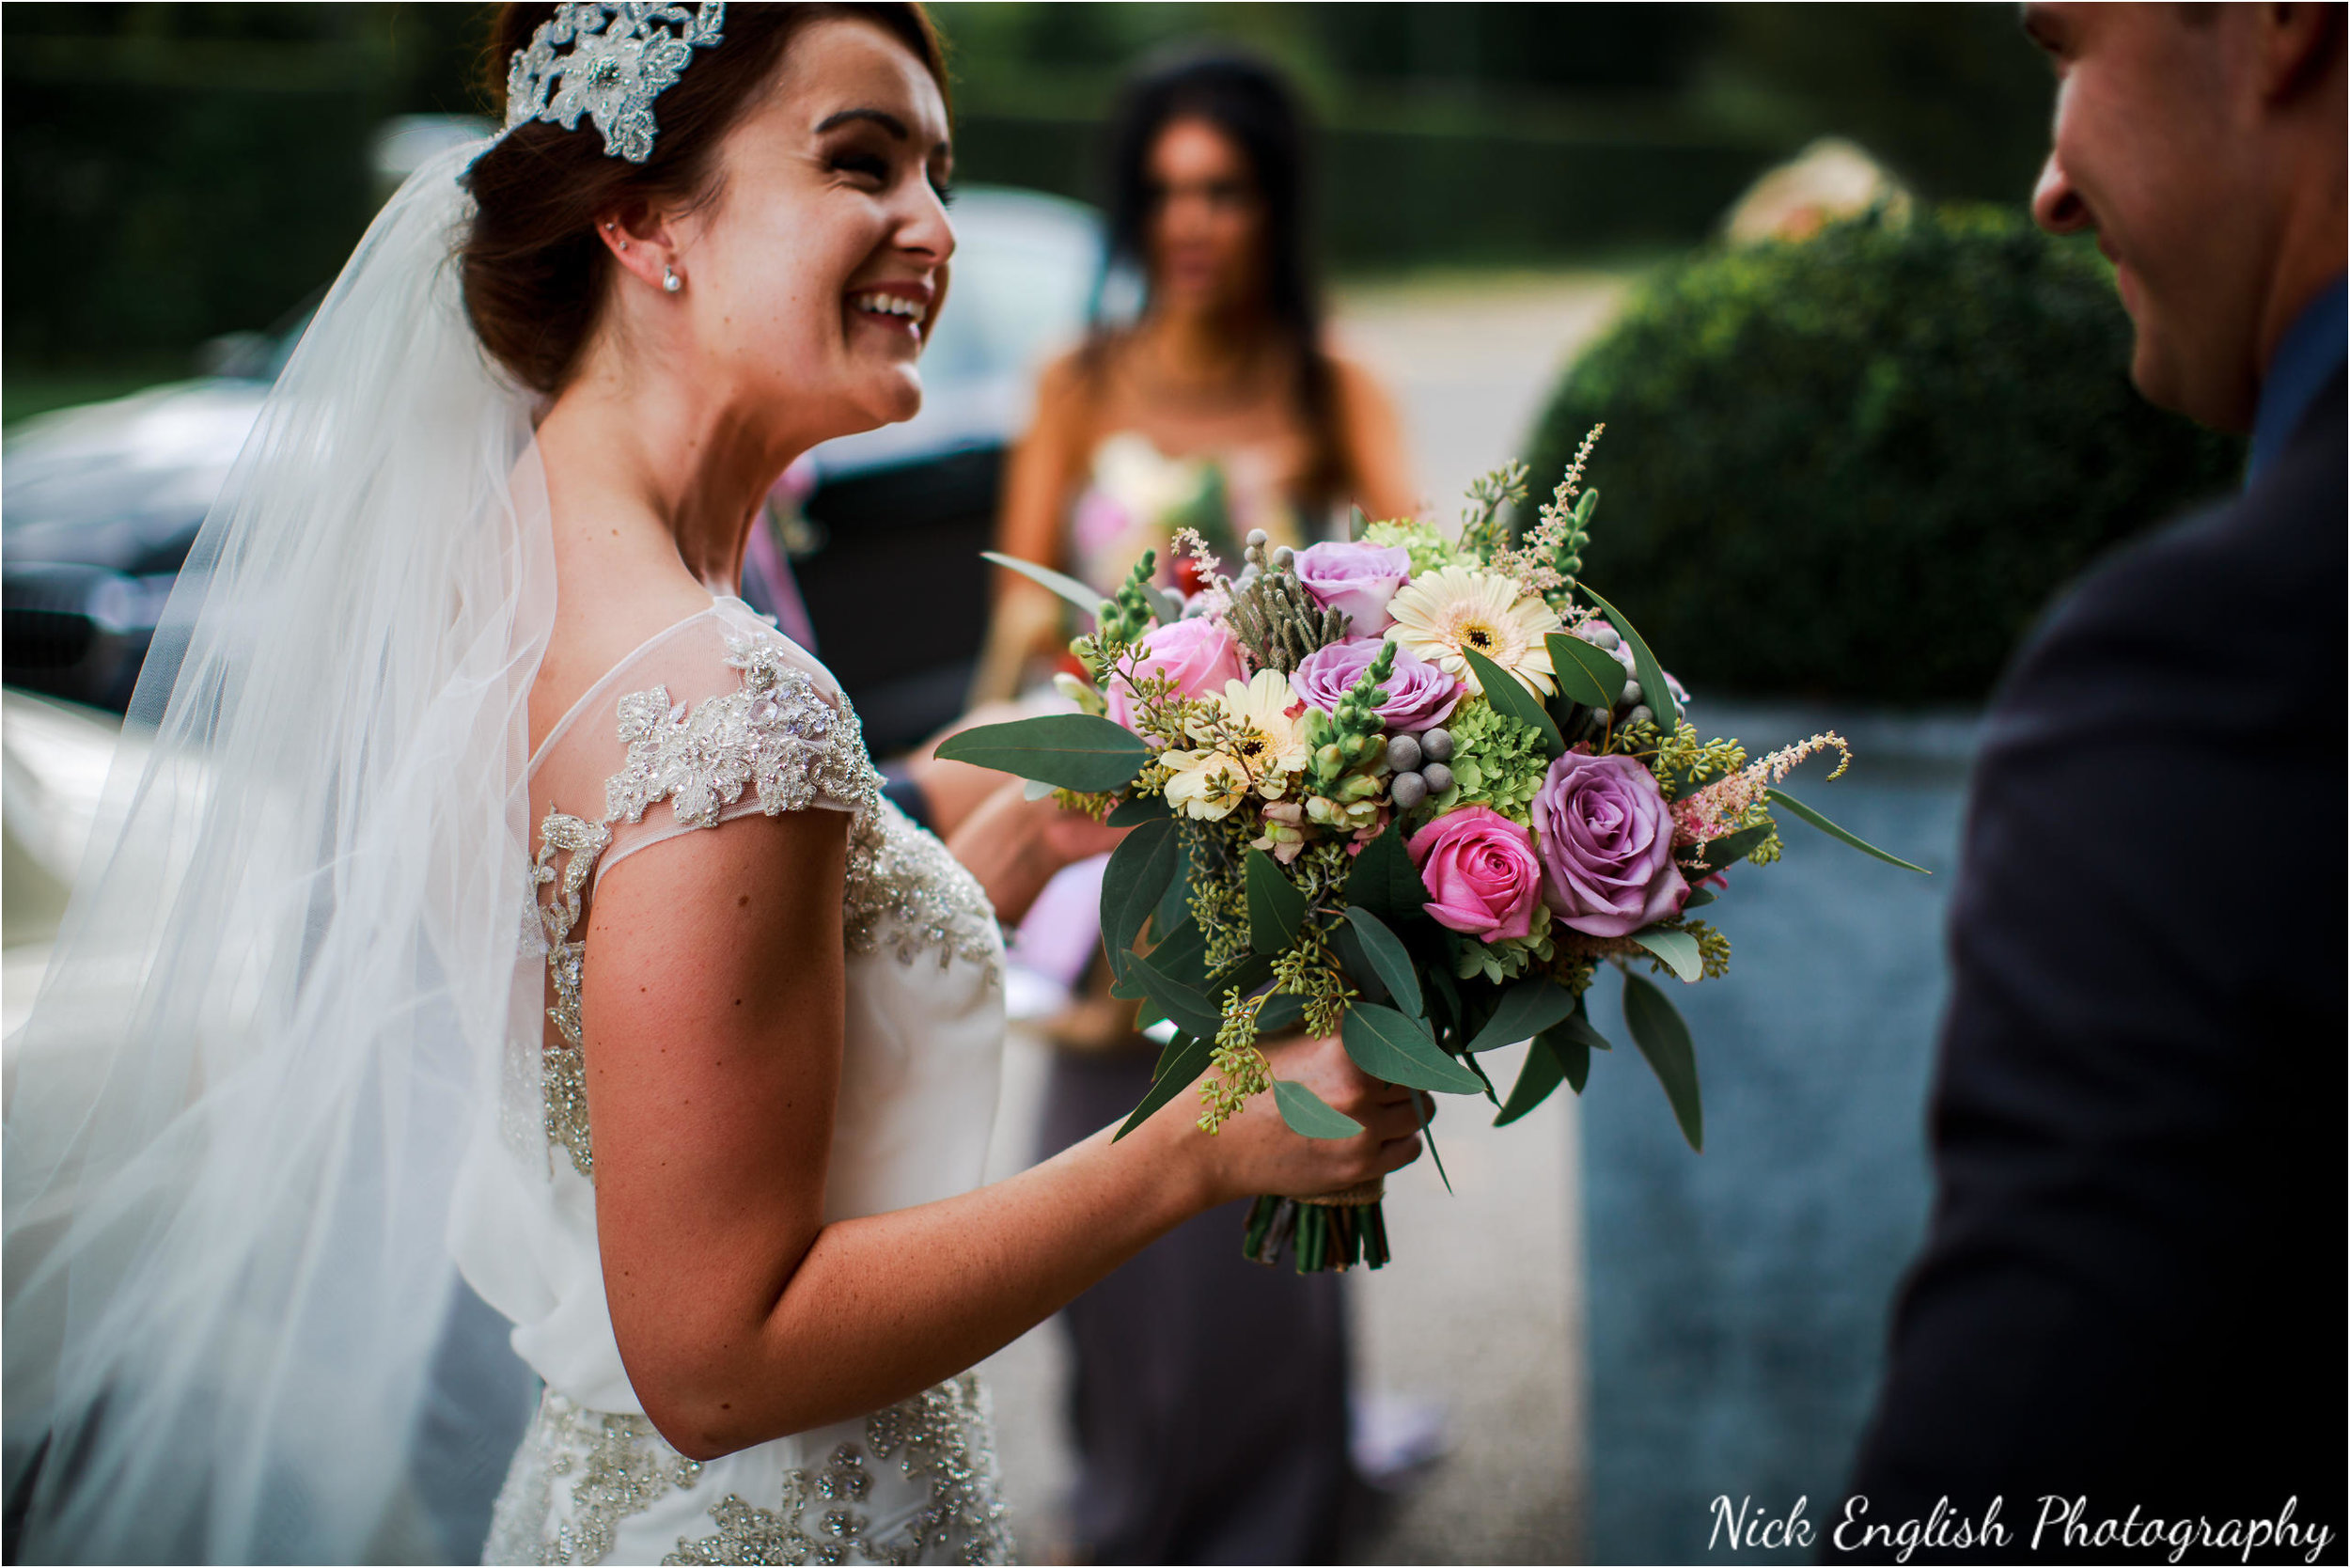 Stacey-Ash-Wedding-Photographs-Stanley-House-Preston-Lancashire-104.jpg